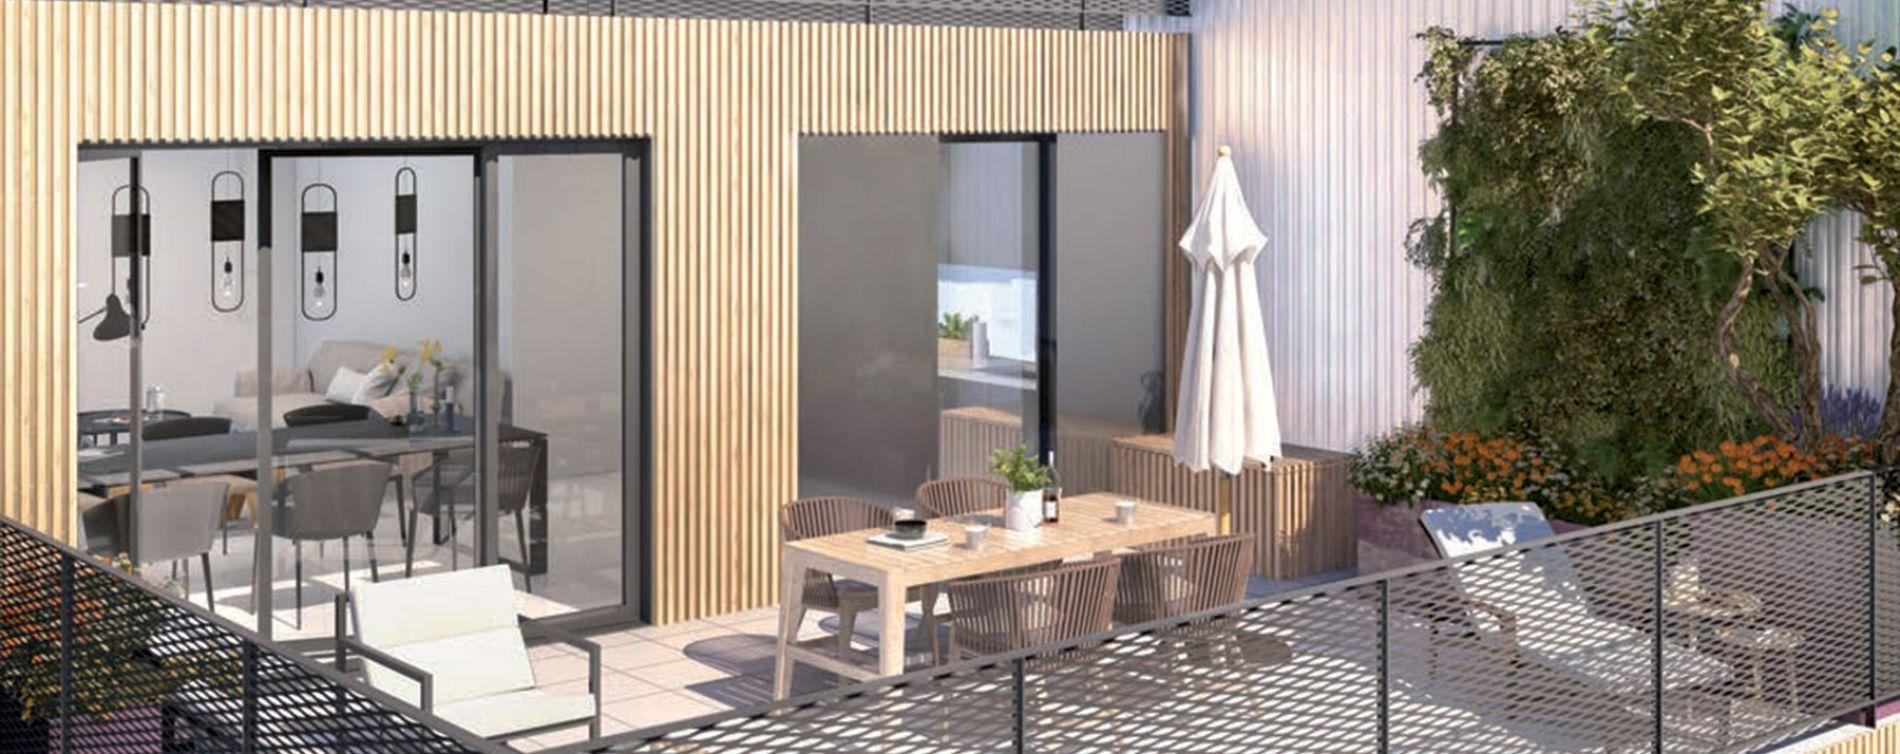 Rosny-sous-Bois : programme immobilier neuve « Reflecto » (2)